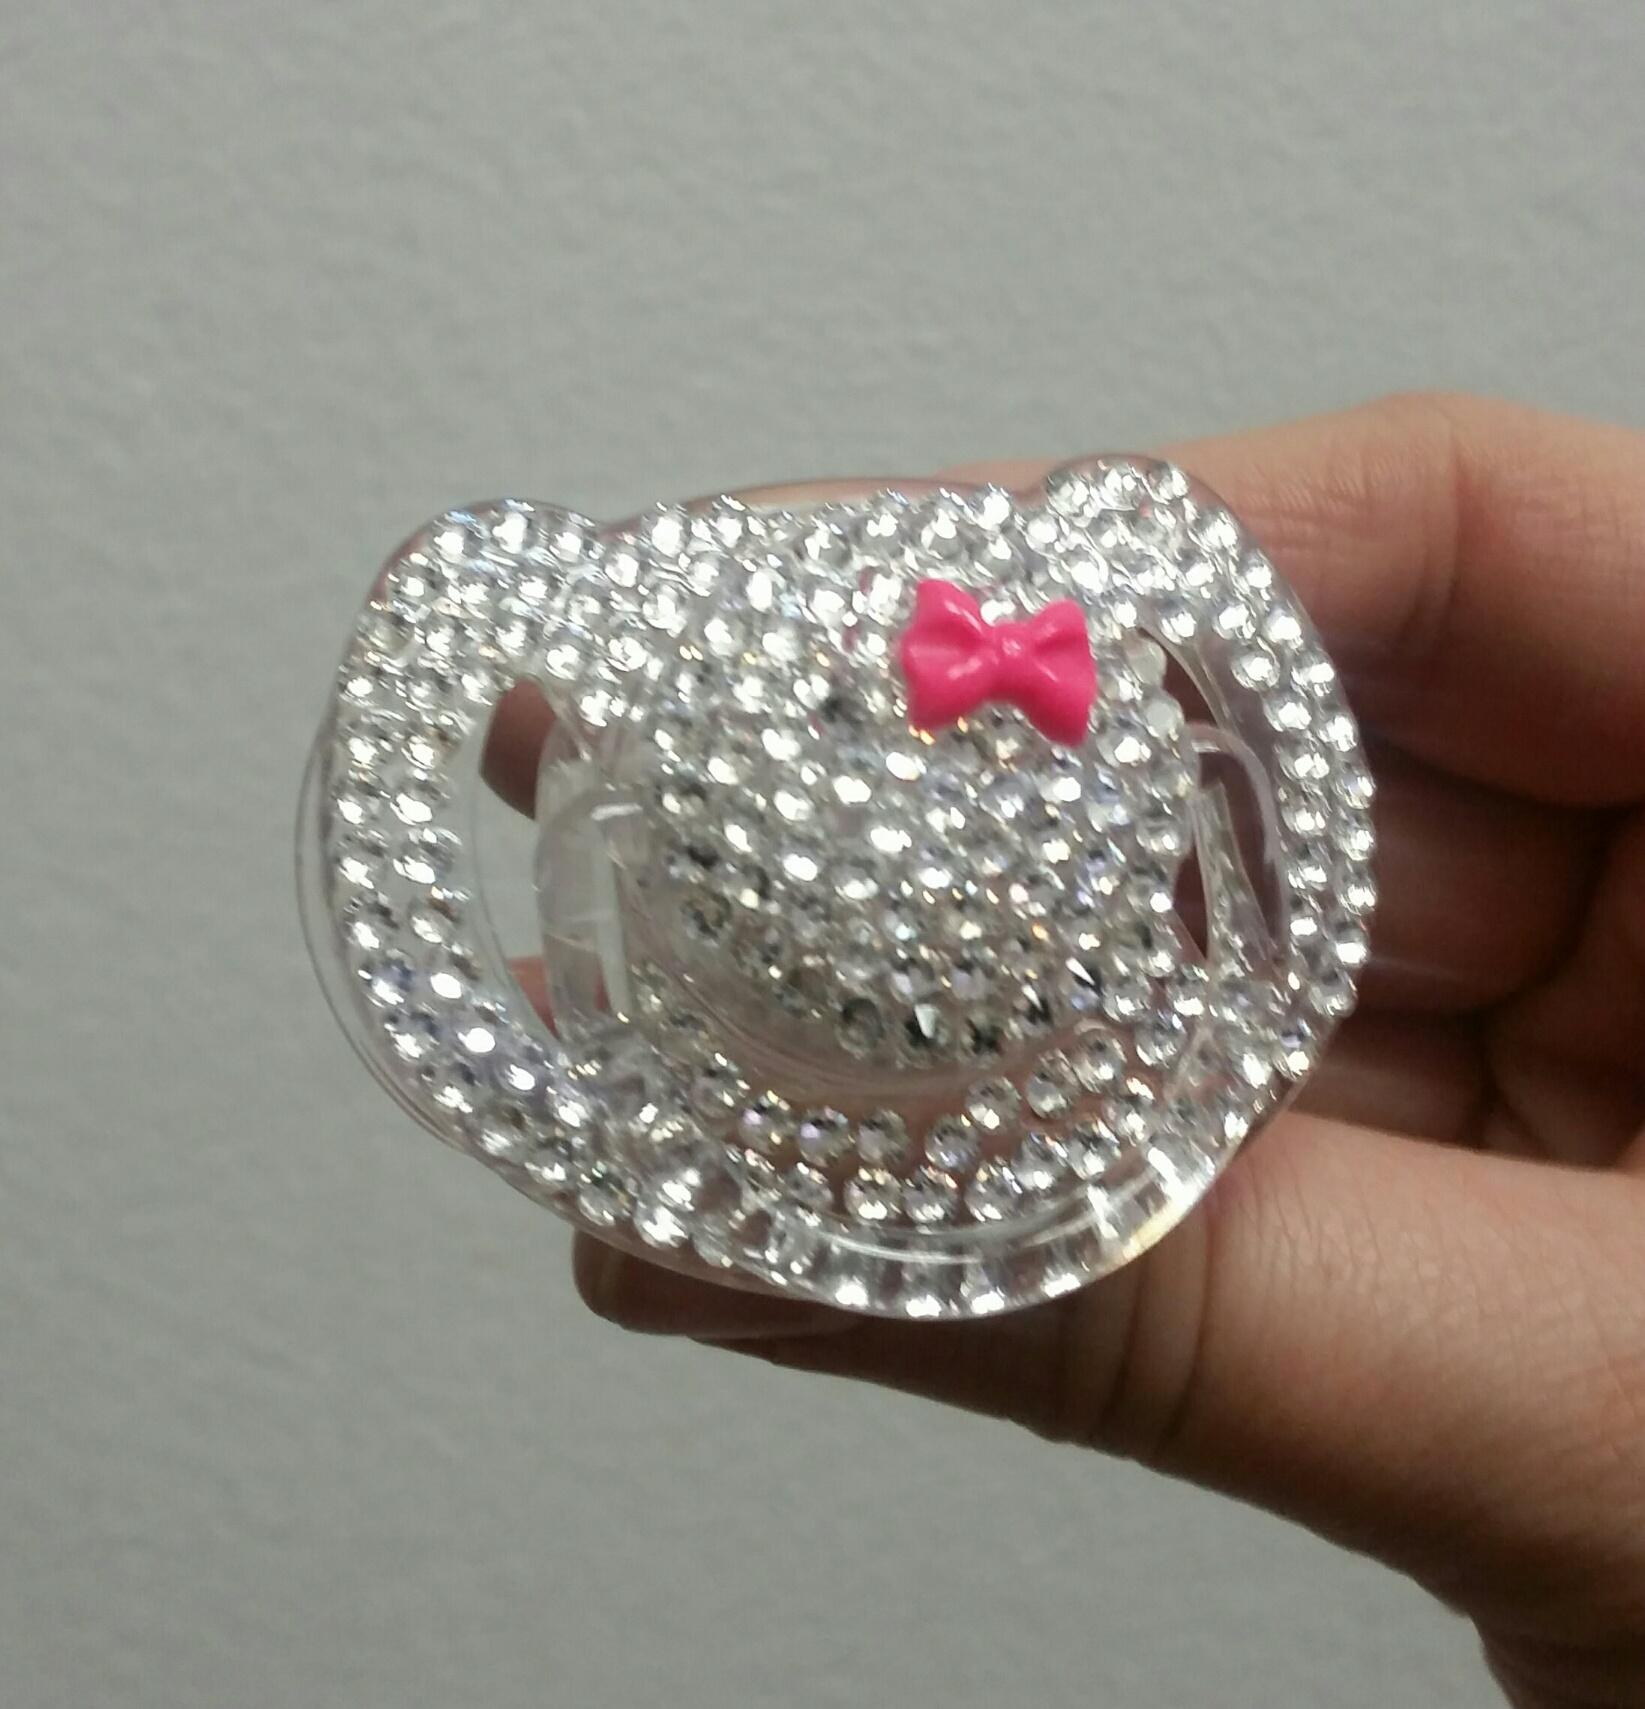 4958f54227cd Jewel swarovski crystal pacifier - hot pink